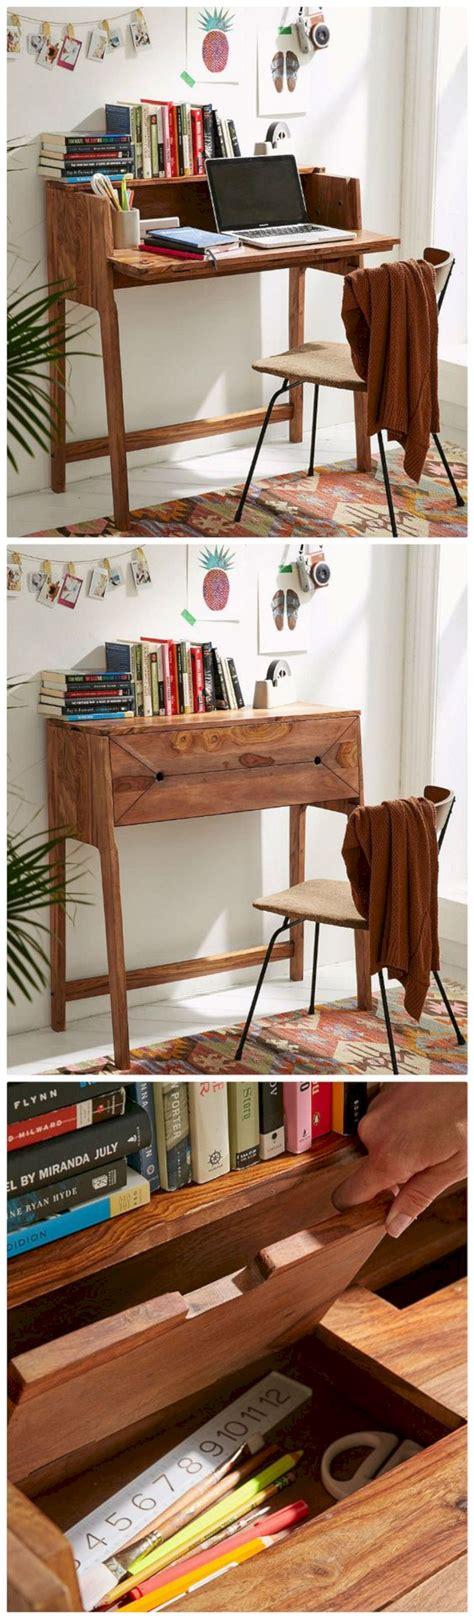 space saving furniture ideas use every corner in your 18 diy space saving furniture ideas futurist architecture